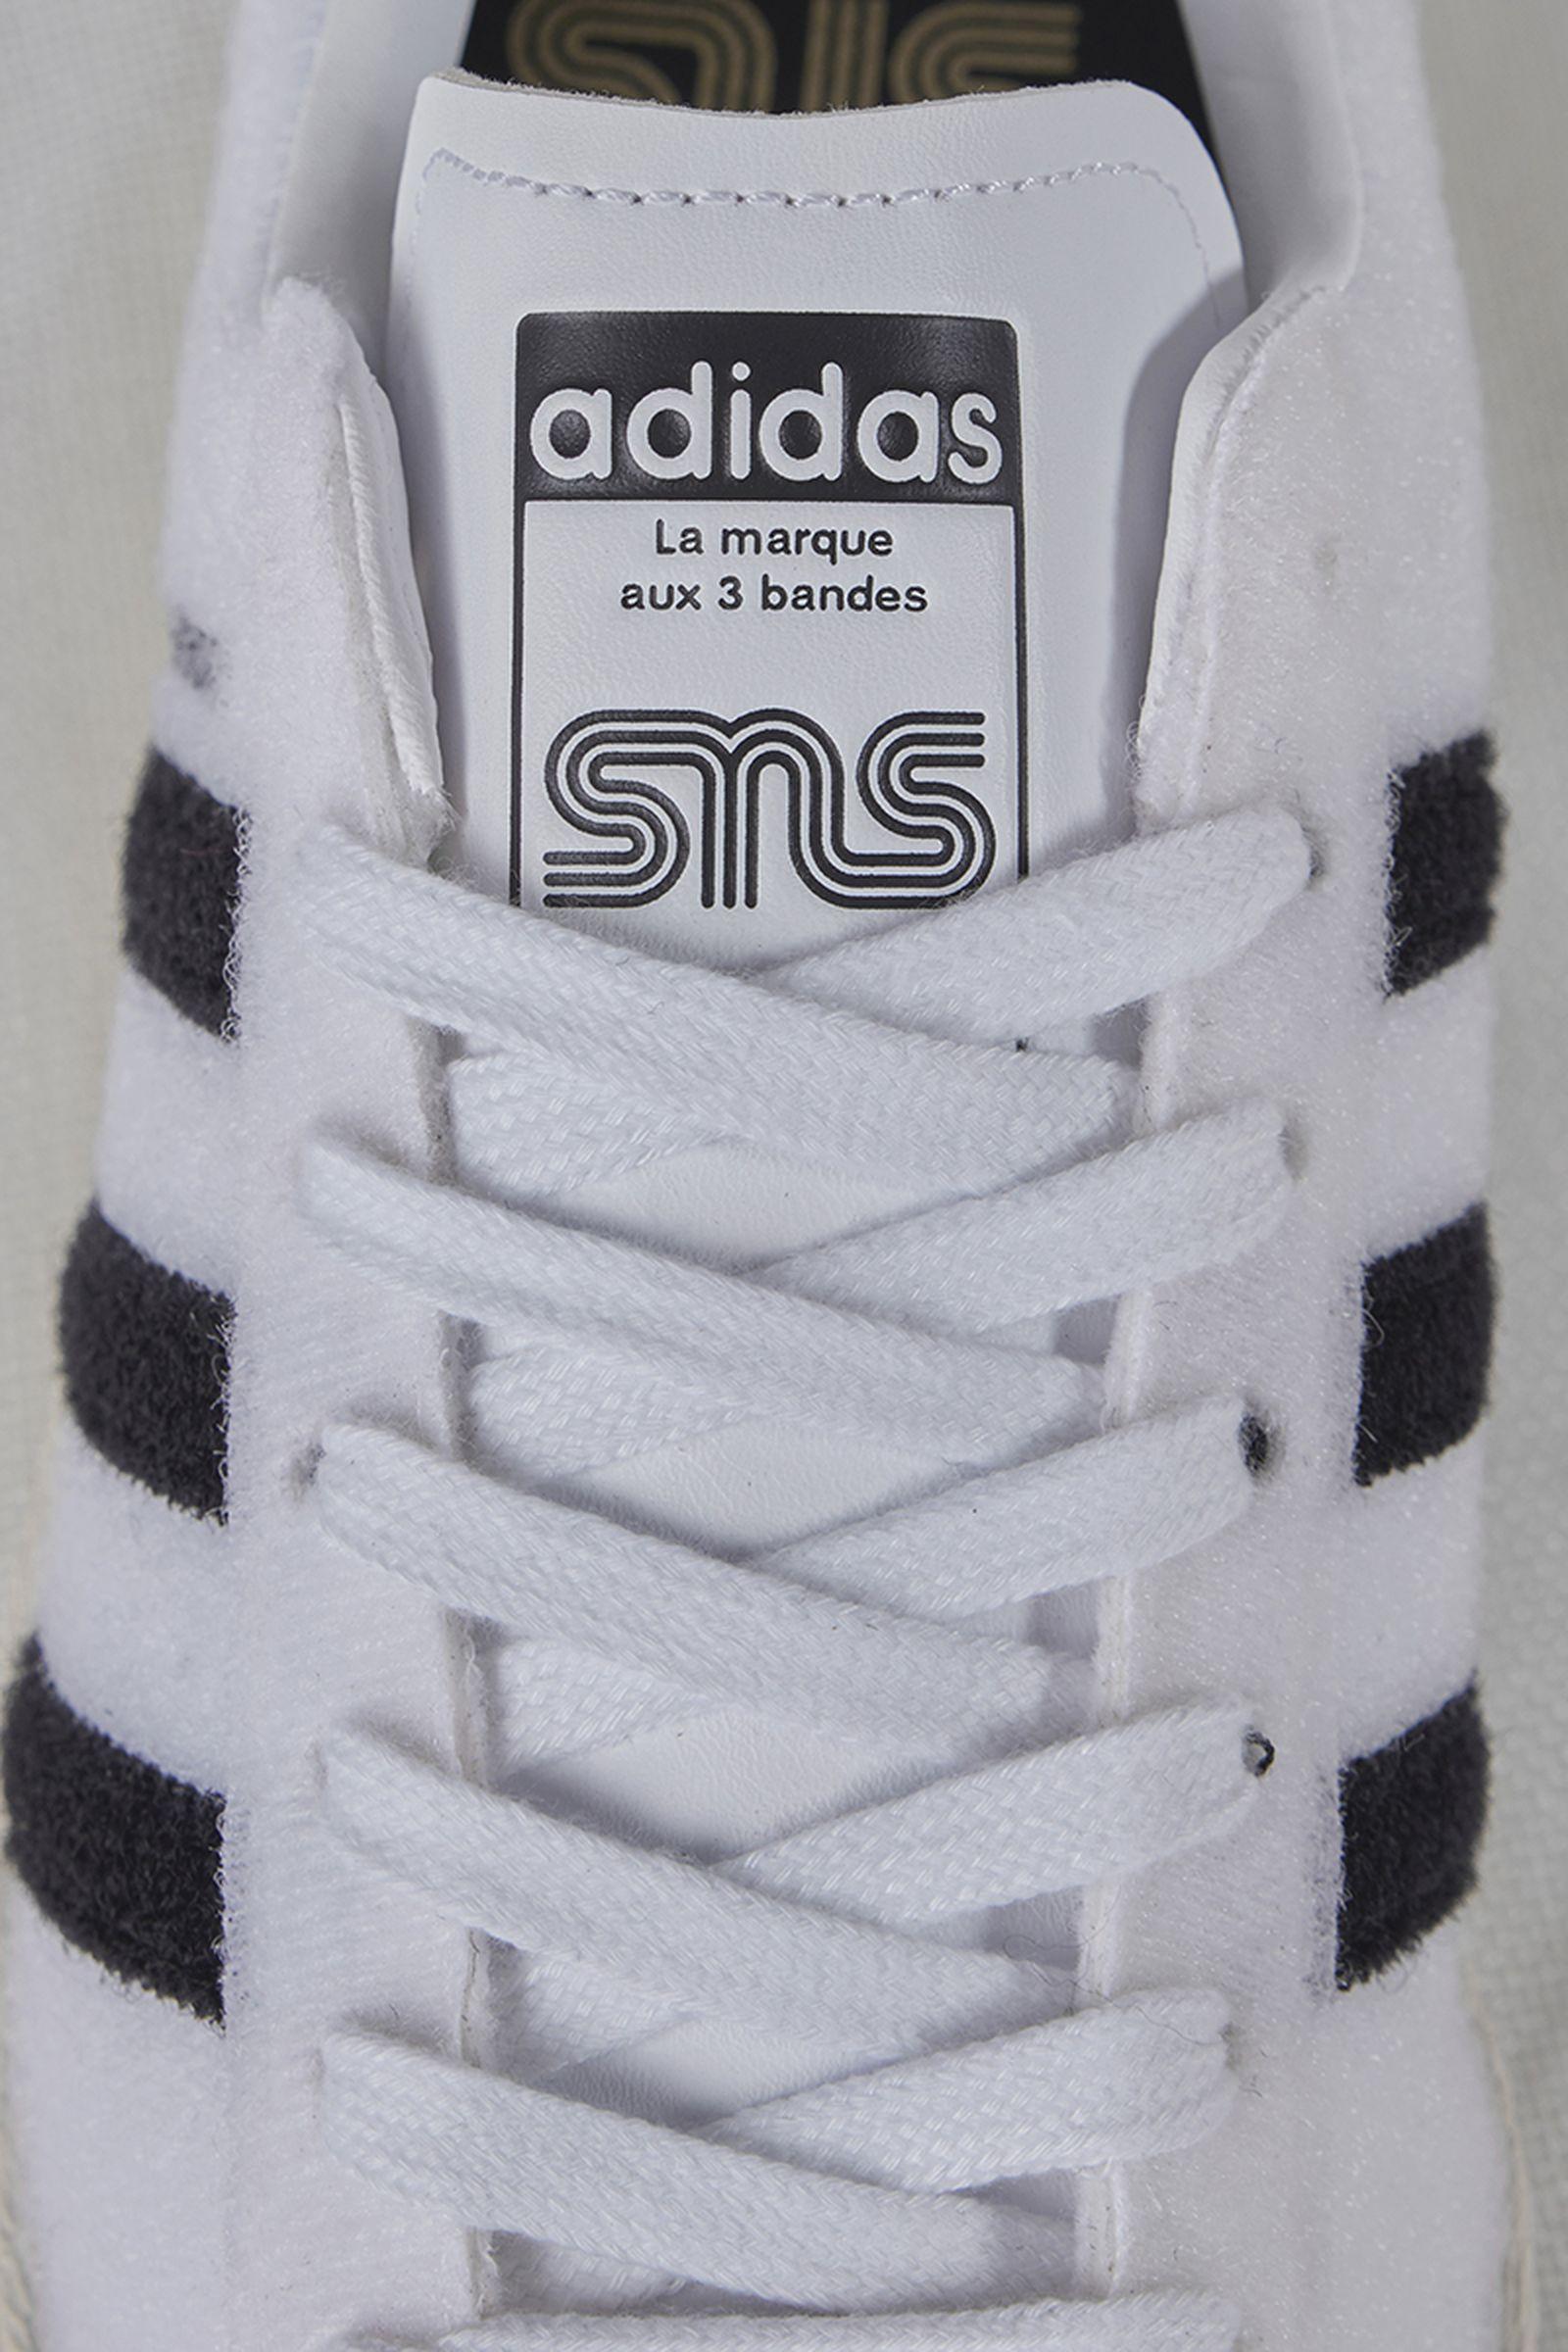 sns-kazuki-kuraishi-adidas-superstar-release-date-price-05